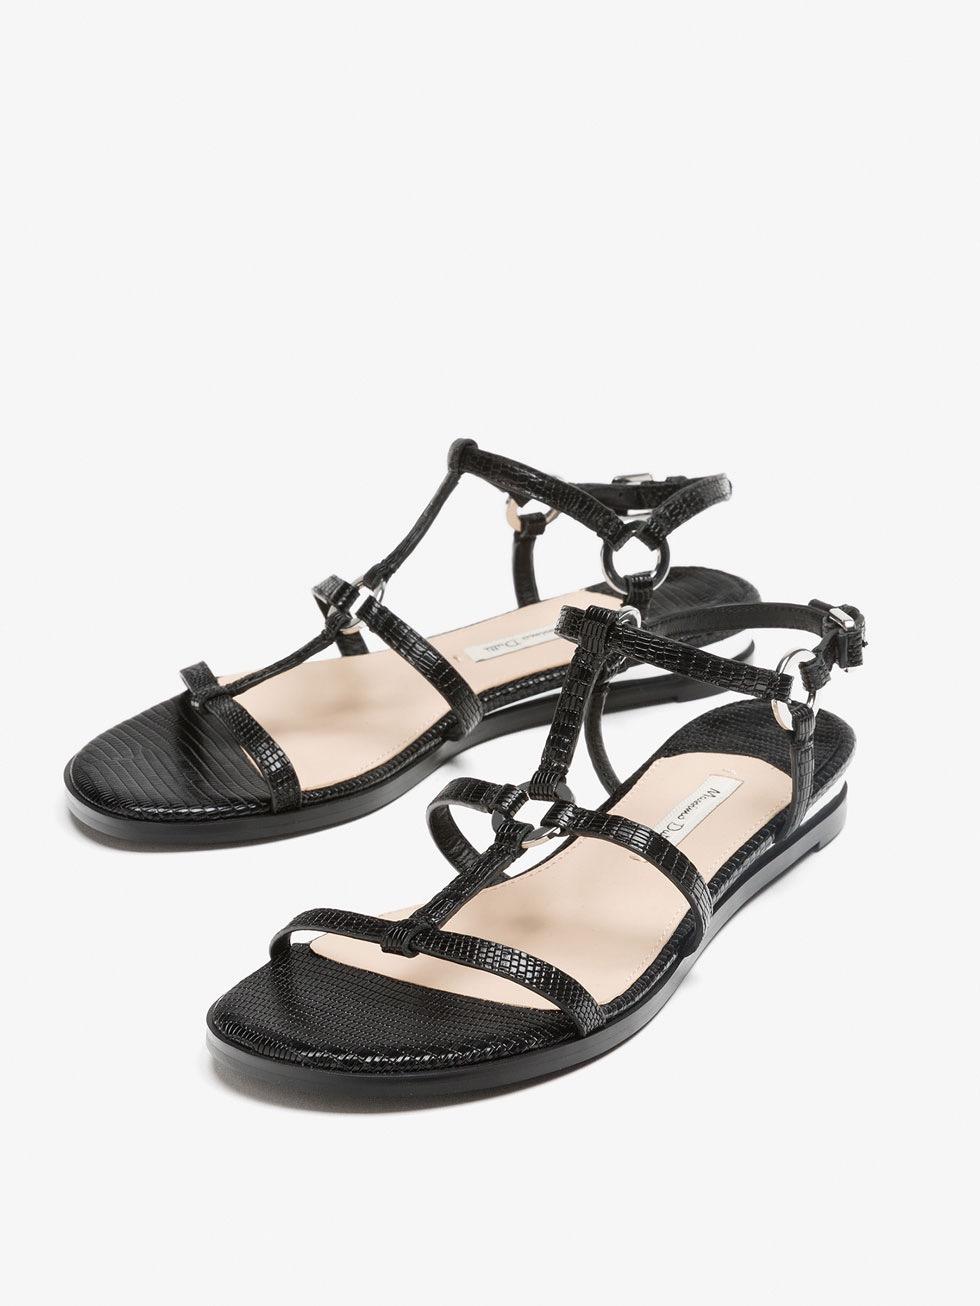 Reptile Effect Sandals